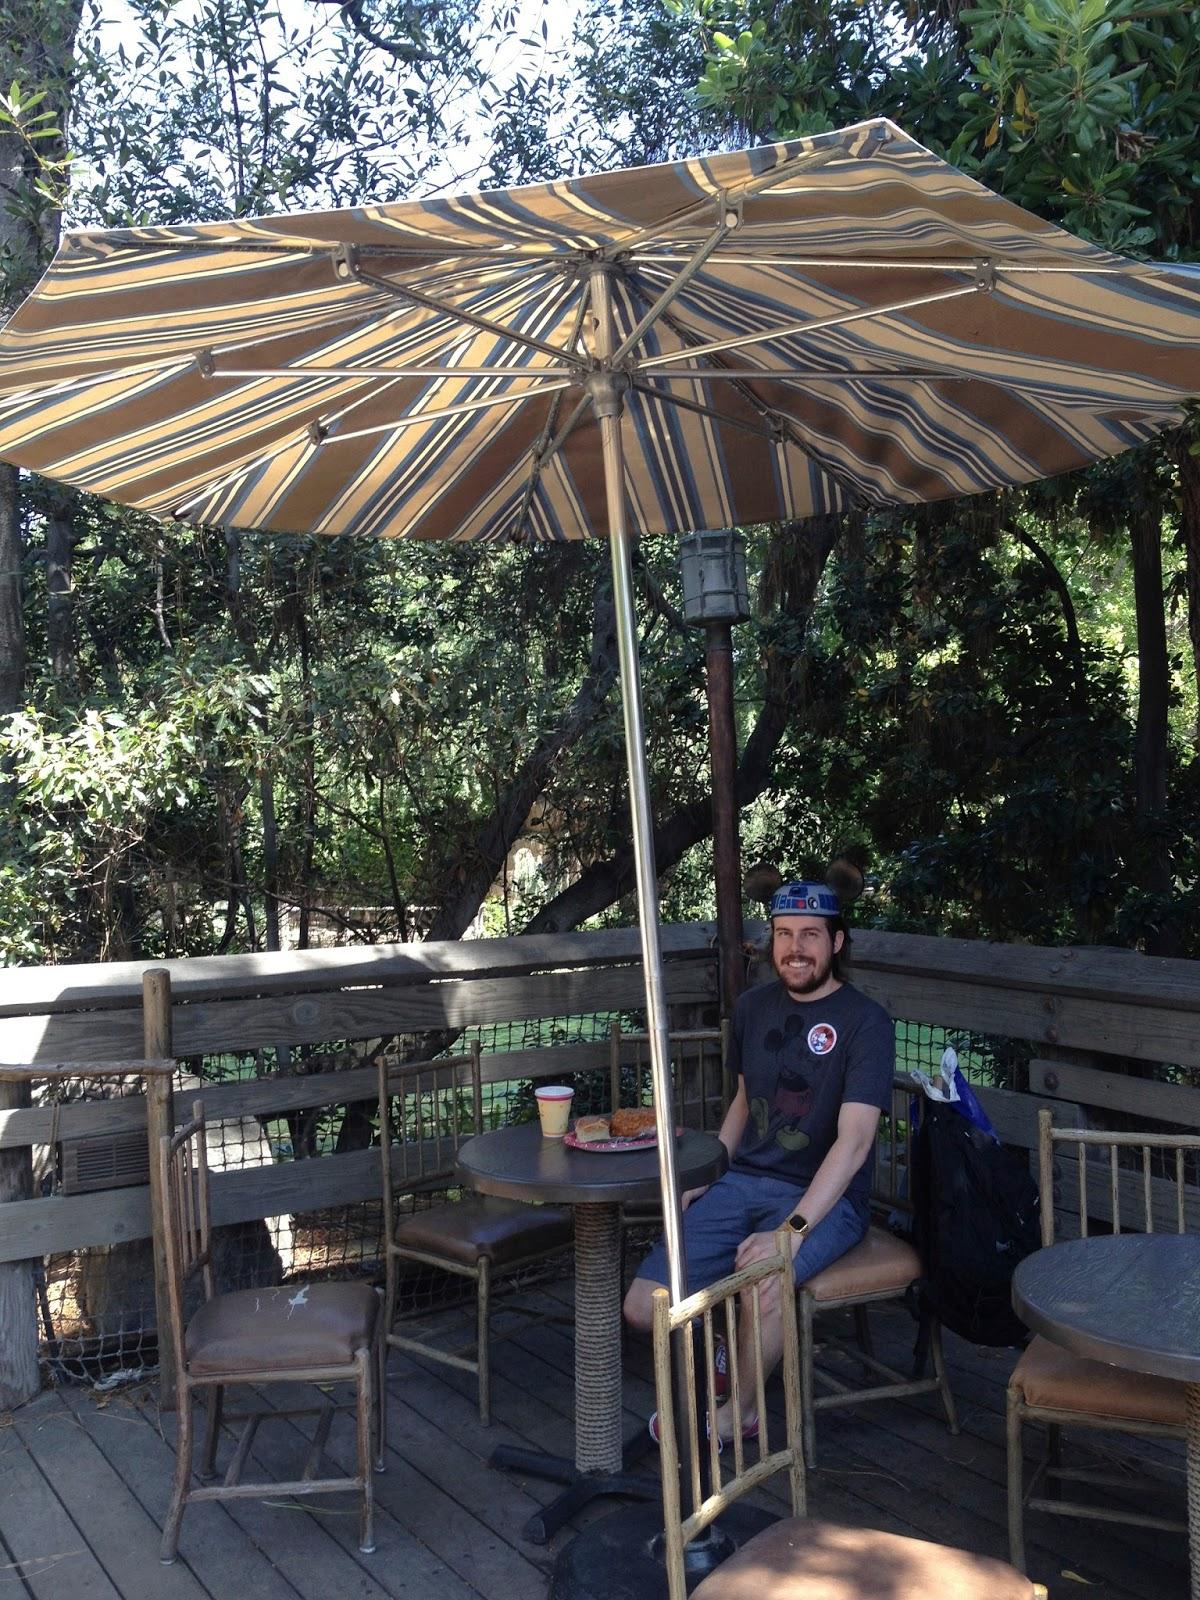 food blog, food blogger, california, where to eat in california, where to eat at disneyland, where to eat at california adventure, disneyland food, disneyland, california adventure, where to eat at california adventure, harbour galley, bread bowl, disney hidden secrets